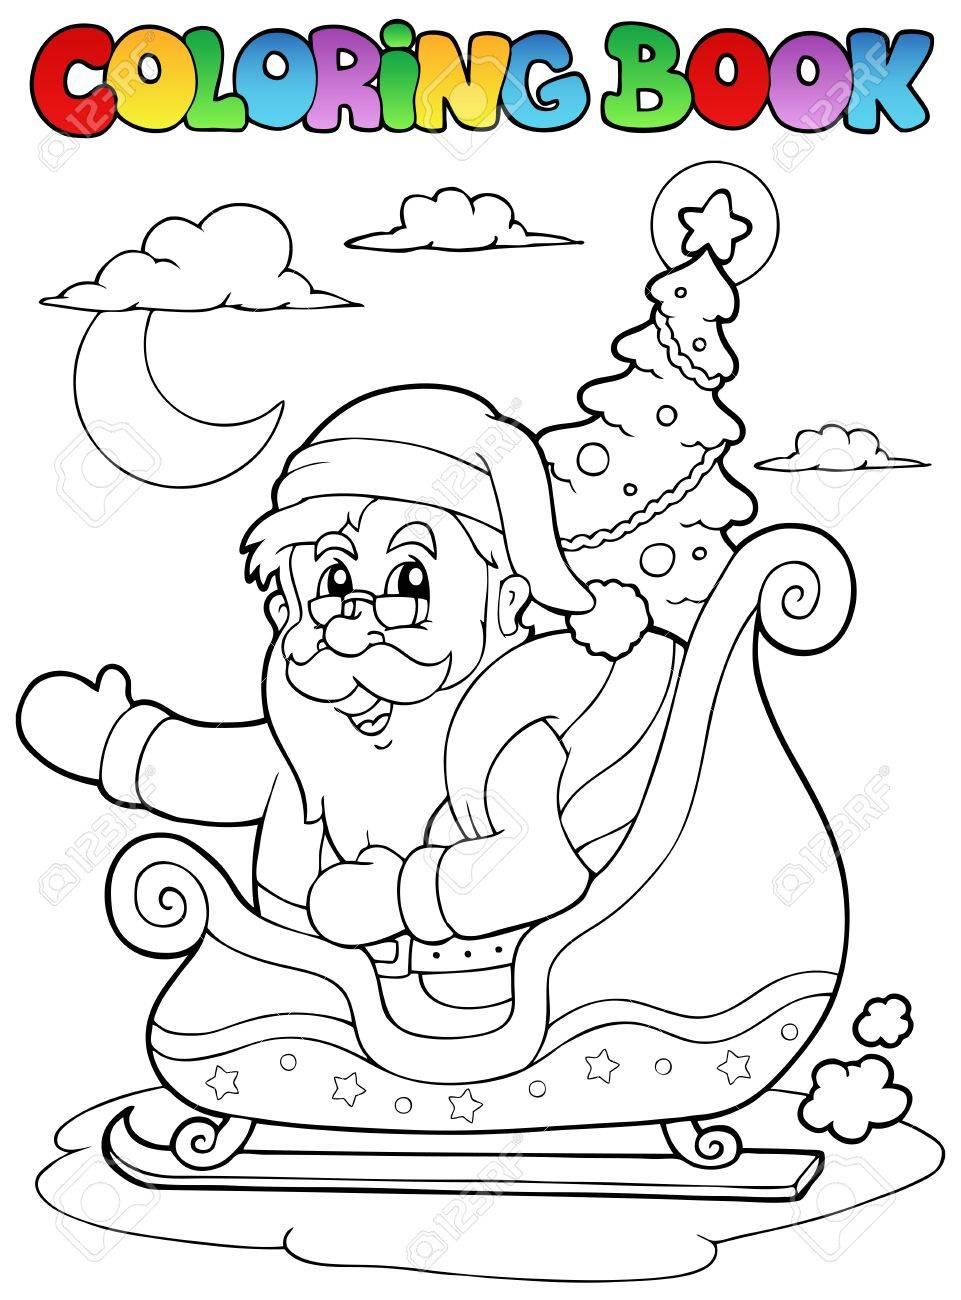 Coloring book Santa Claus theme  illustration. Stock Vector - 11505350